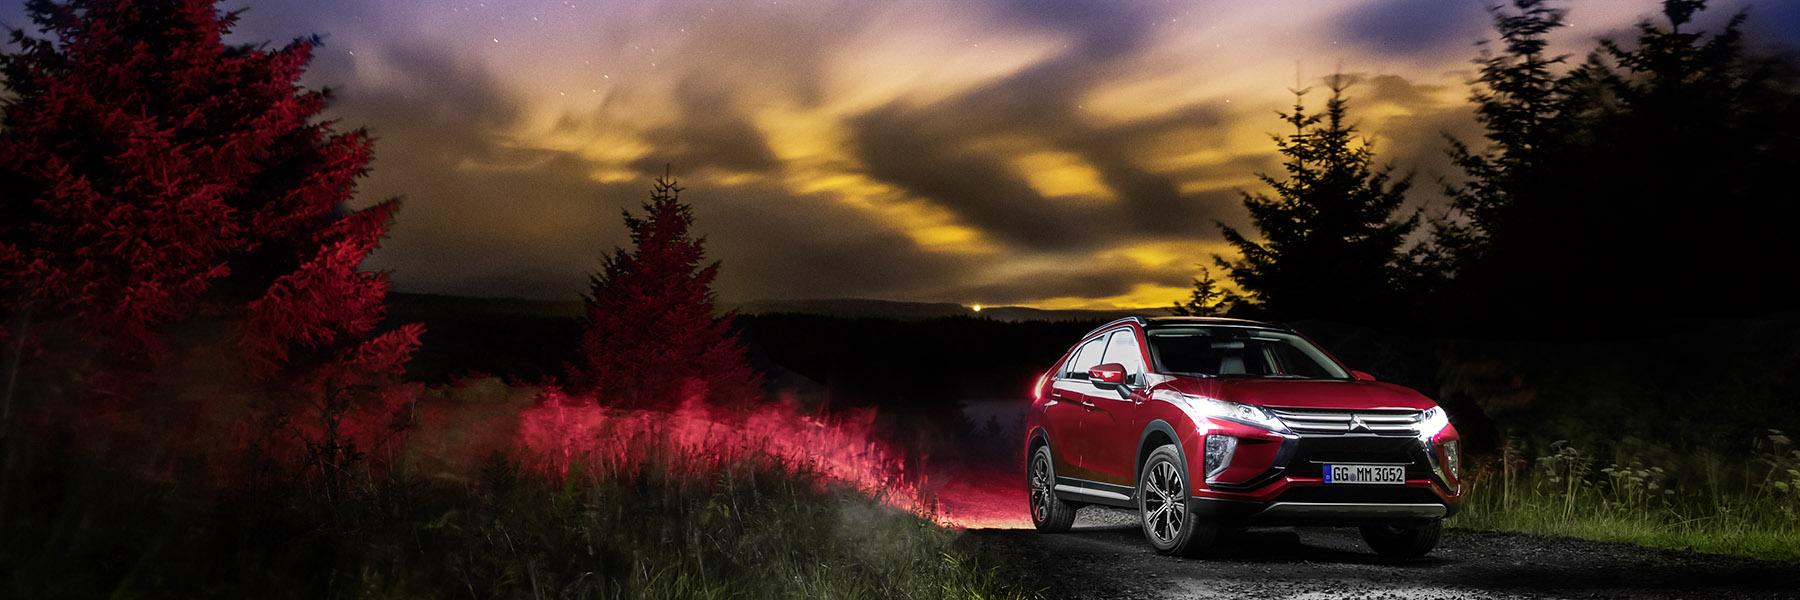 Mitsubishi Six Nations 200 Eclipse Fuel Filter Location New Cross Suv Adventure